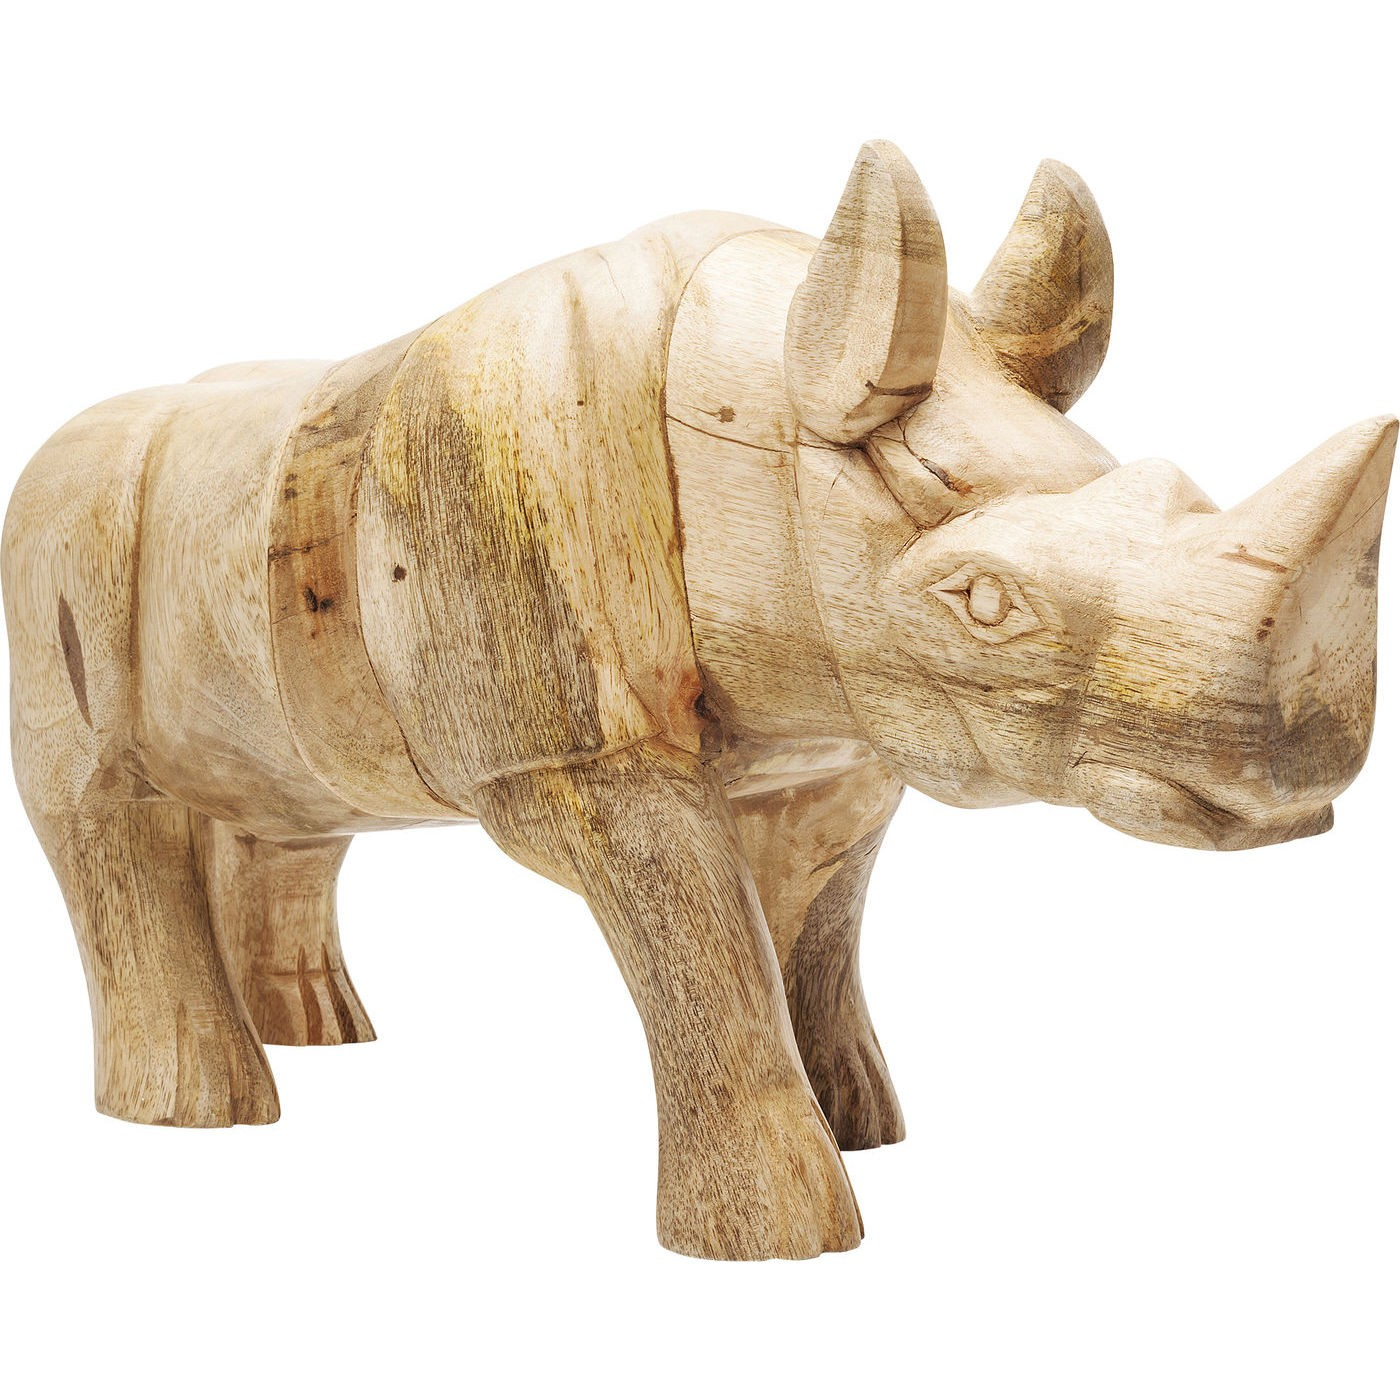 Image of   Dekoration Figur Rhino Træ